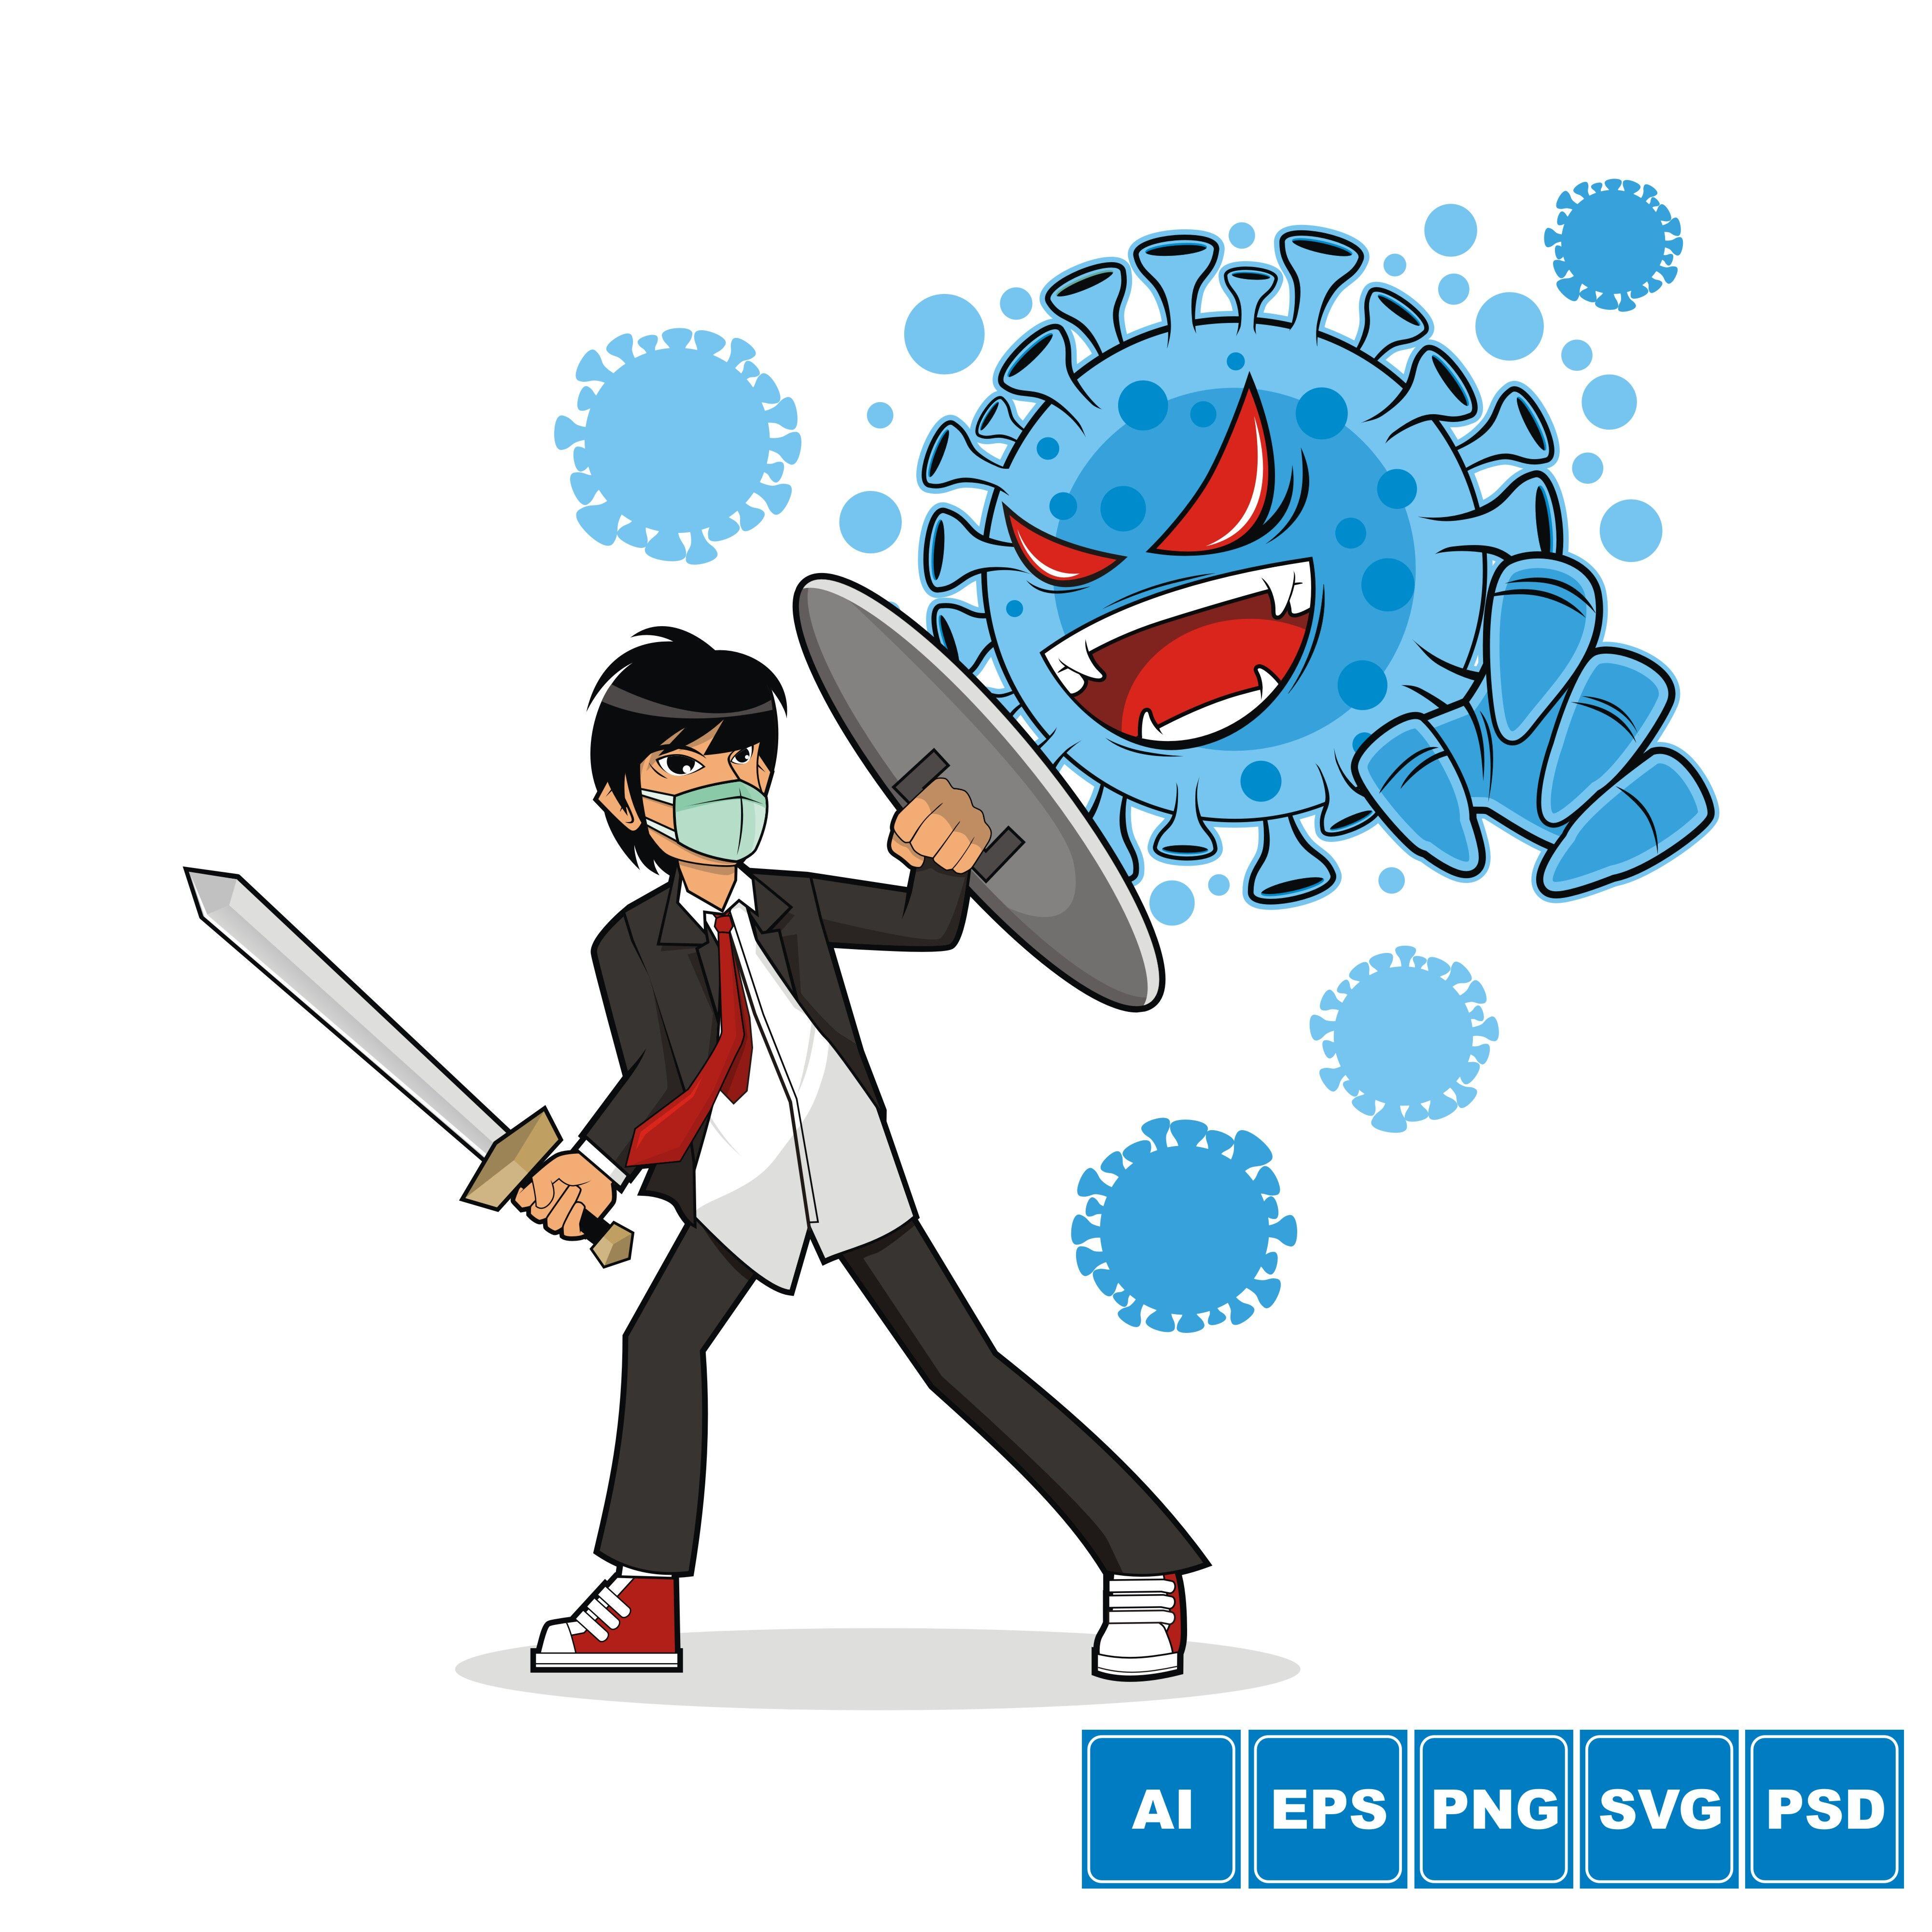 A Guy Against Corona Virus Vector Illustration By Azkaryzki